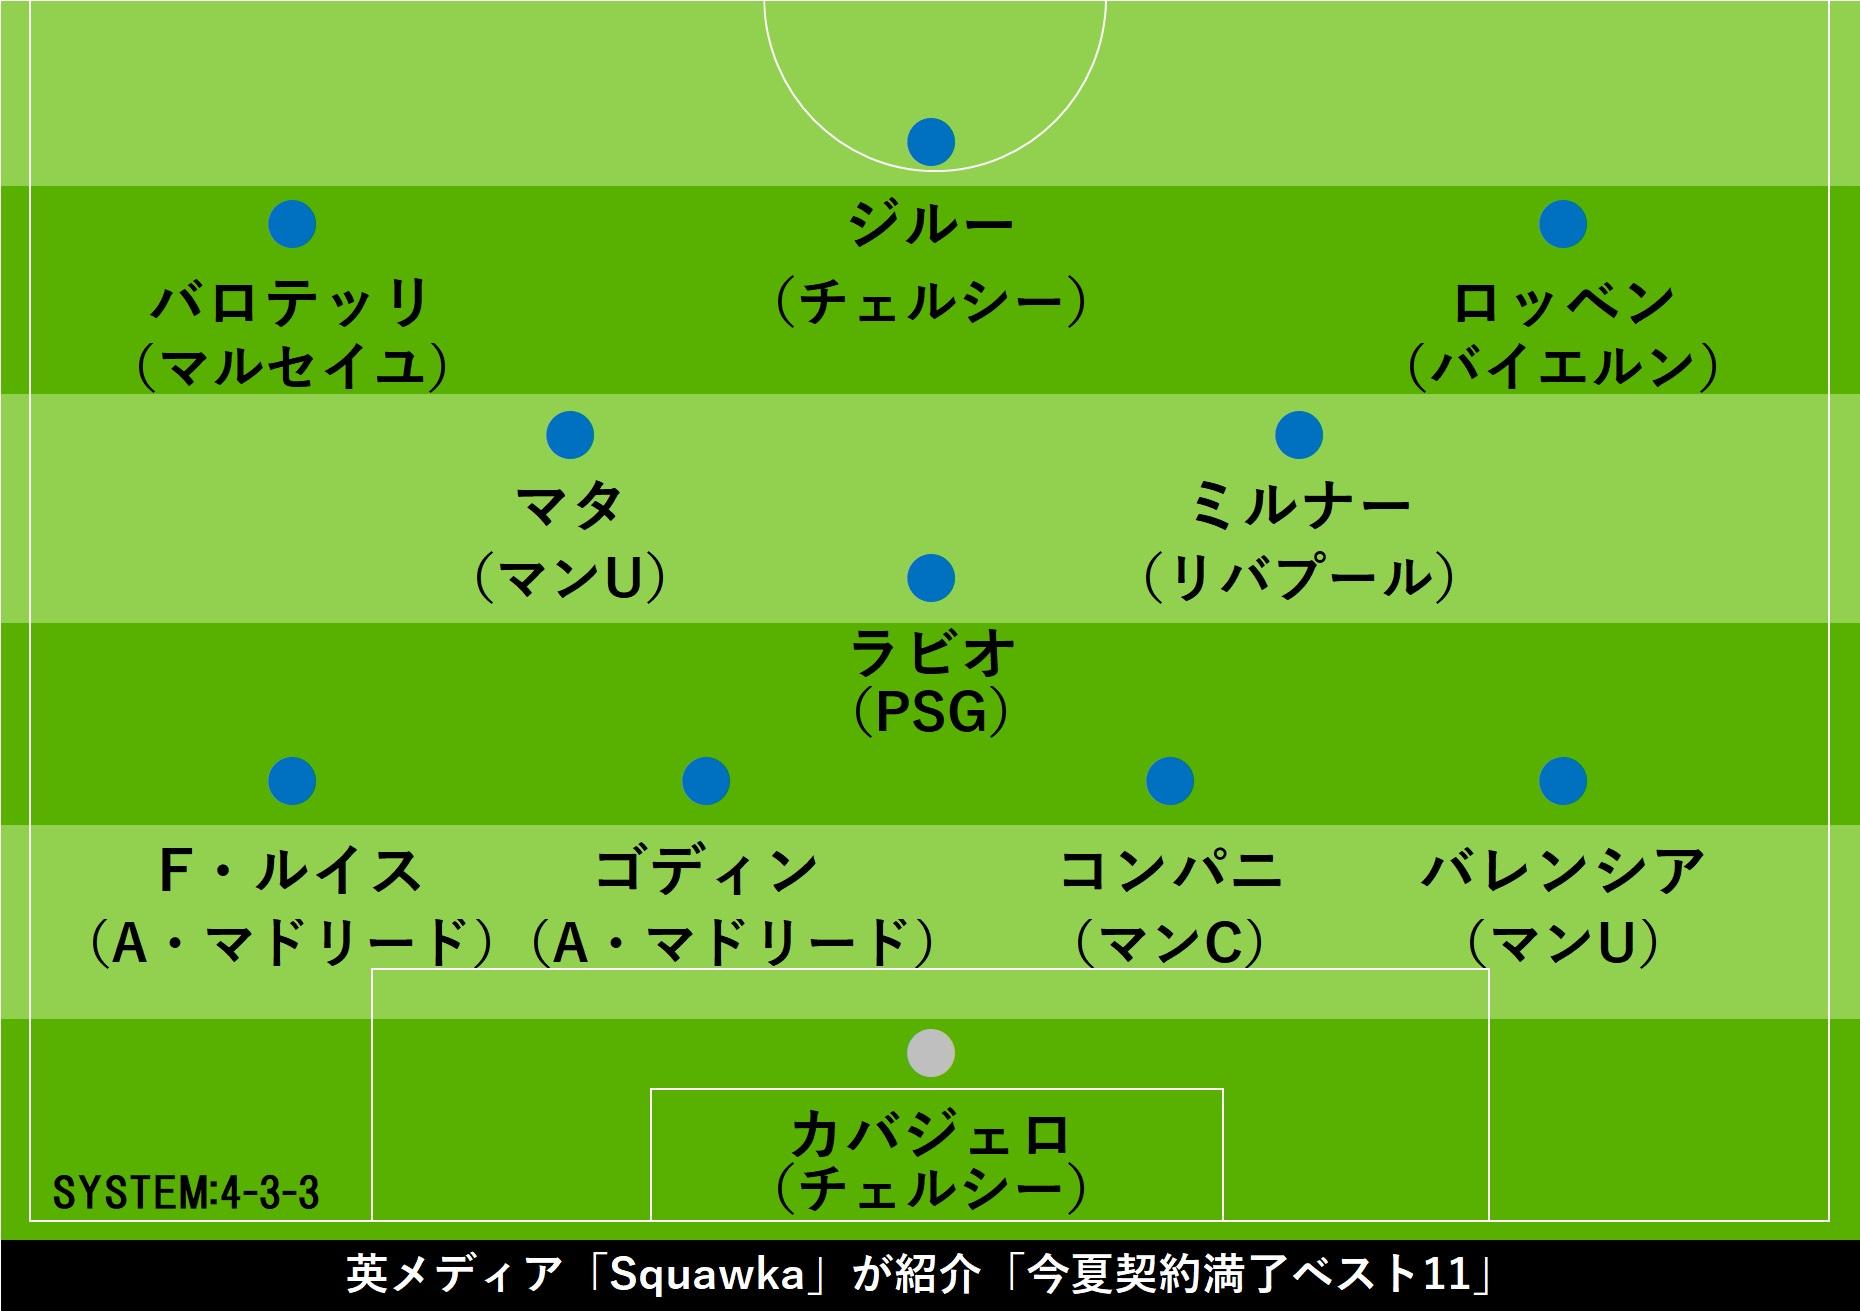 「Squawka」選出、今夏フリーになる選手ベストイレブン【画像:Football ZONE web】